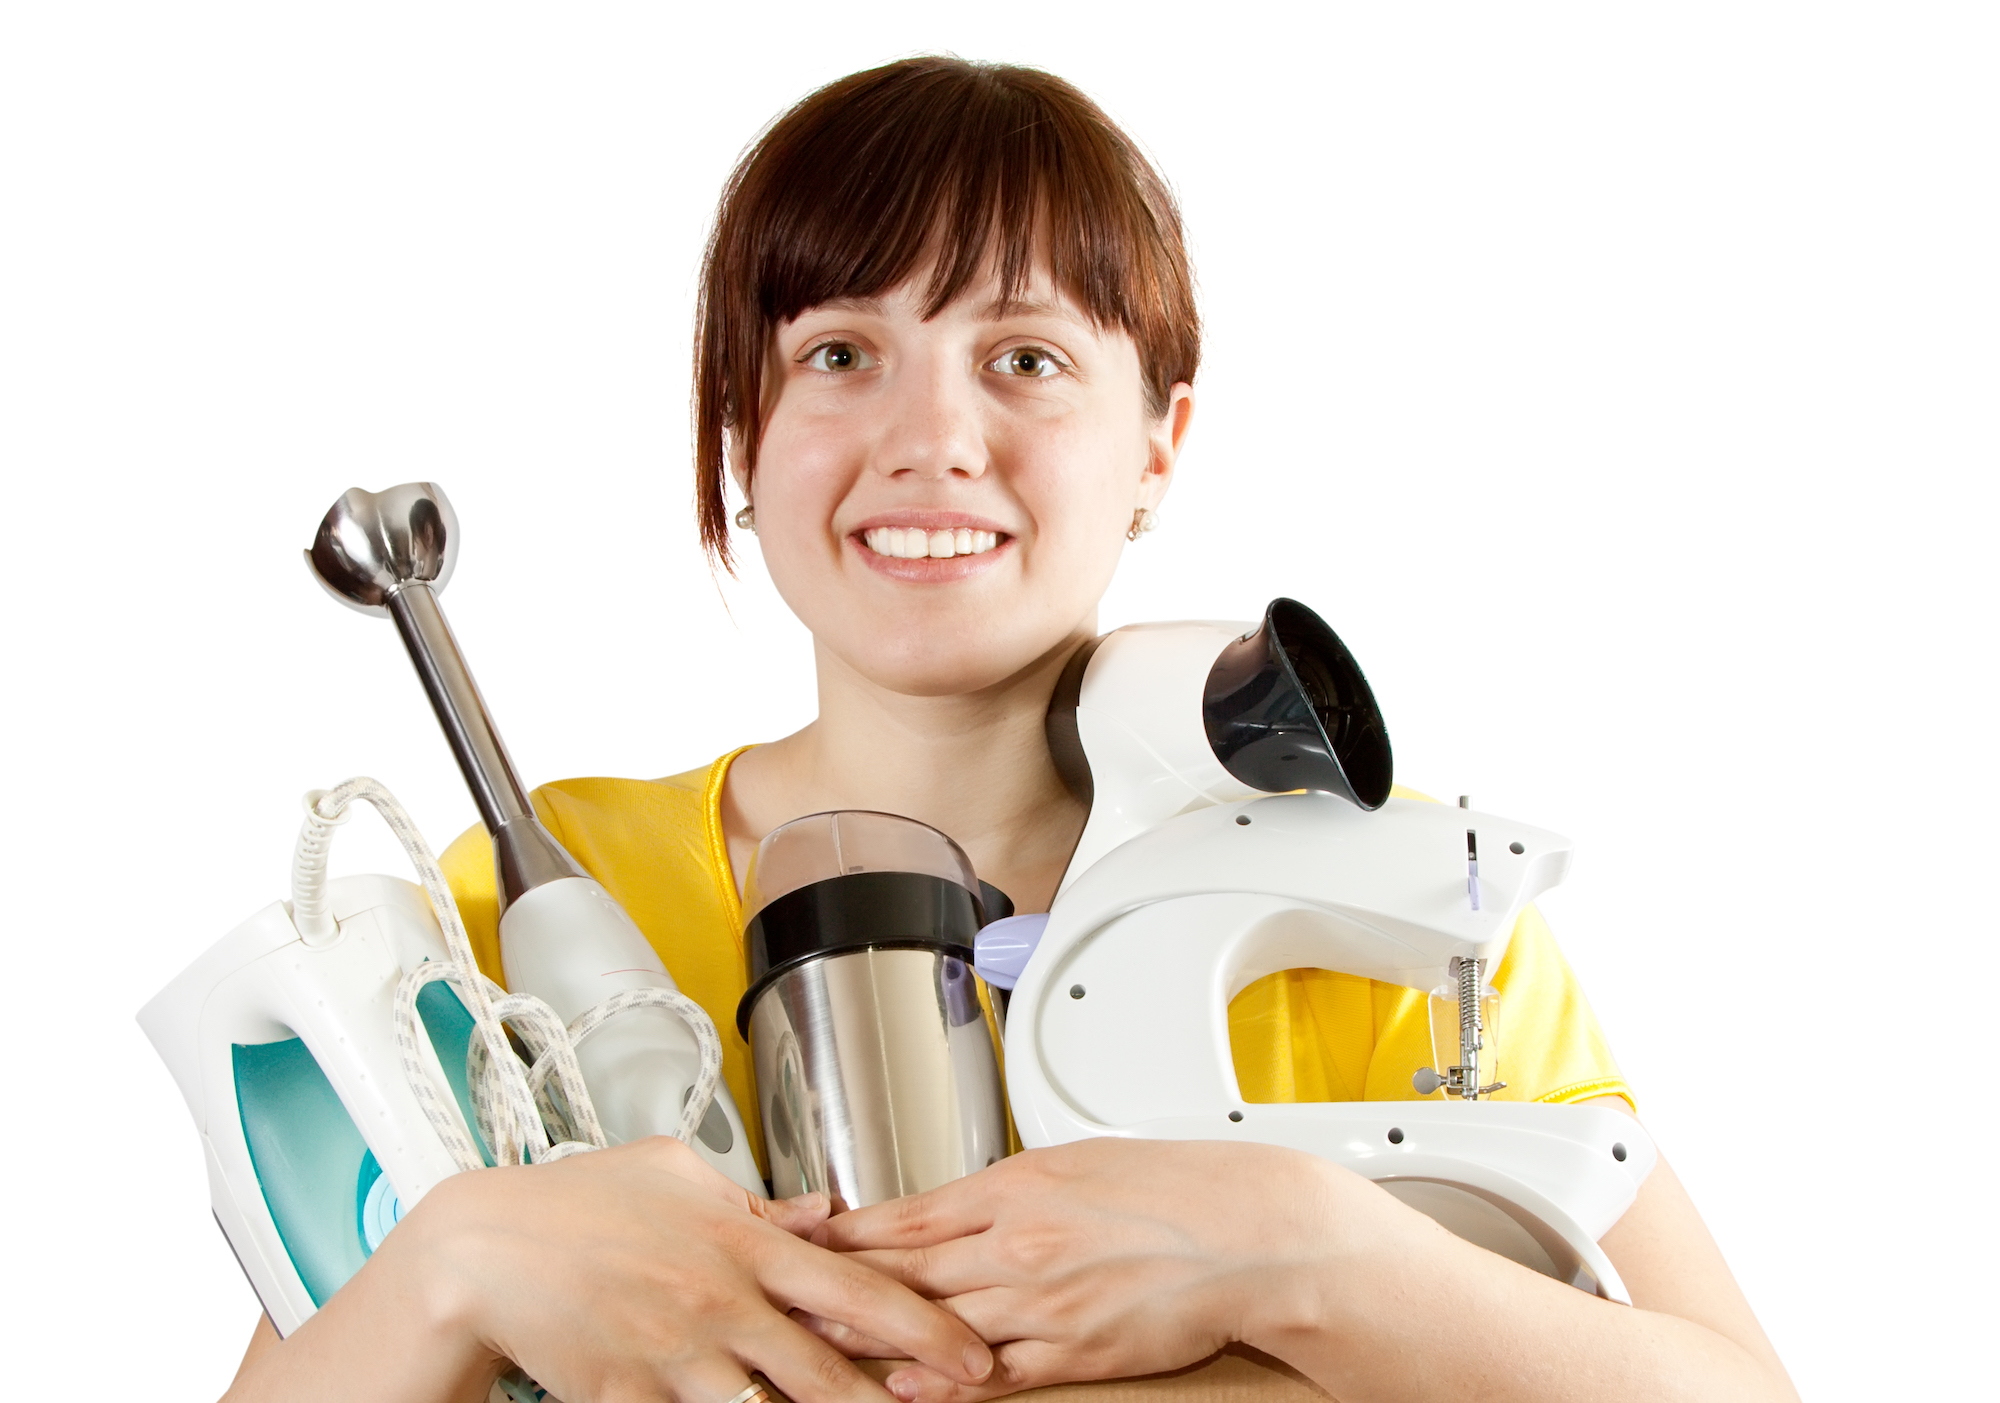 breville. image shows women holding multiple appliances like breville's.